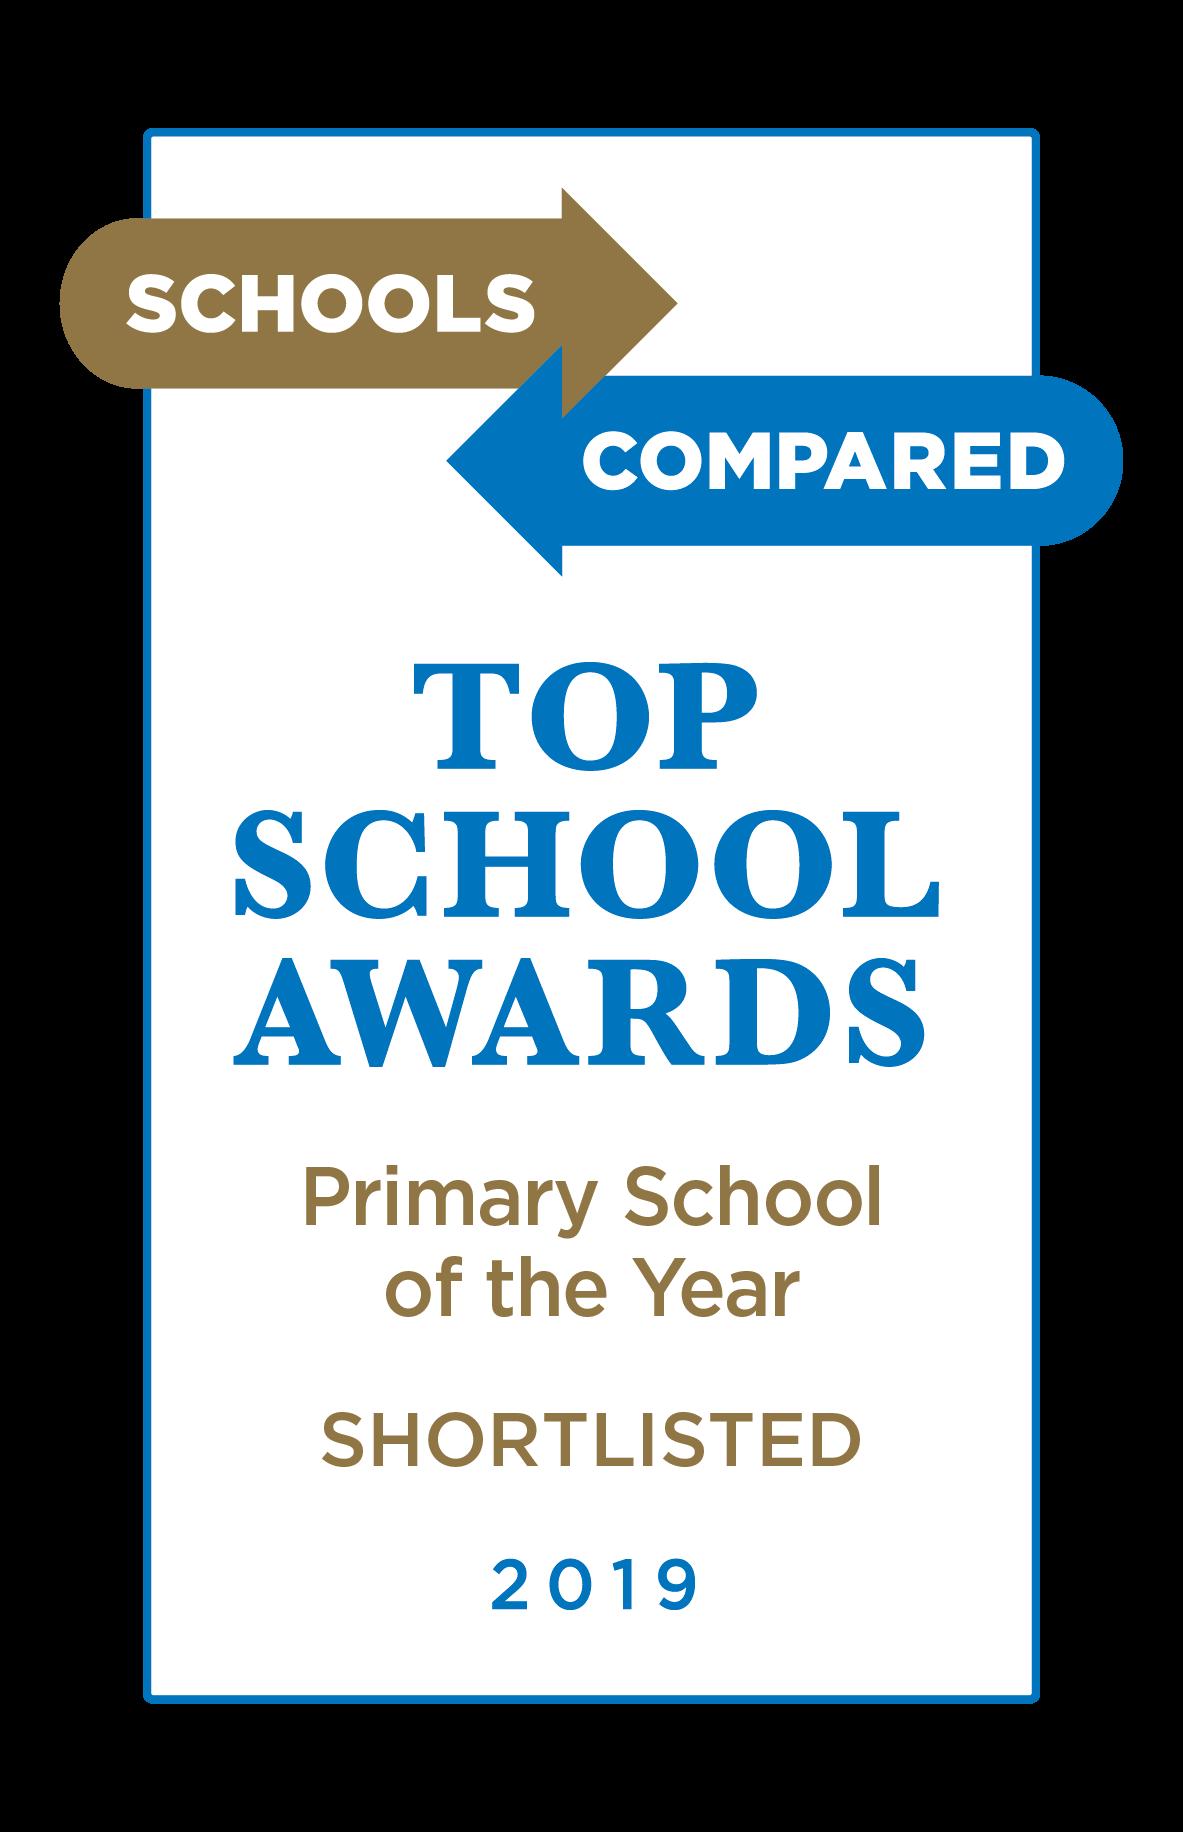 Top Schools in the UAE - The SchoolsCompared com Awards